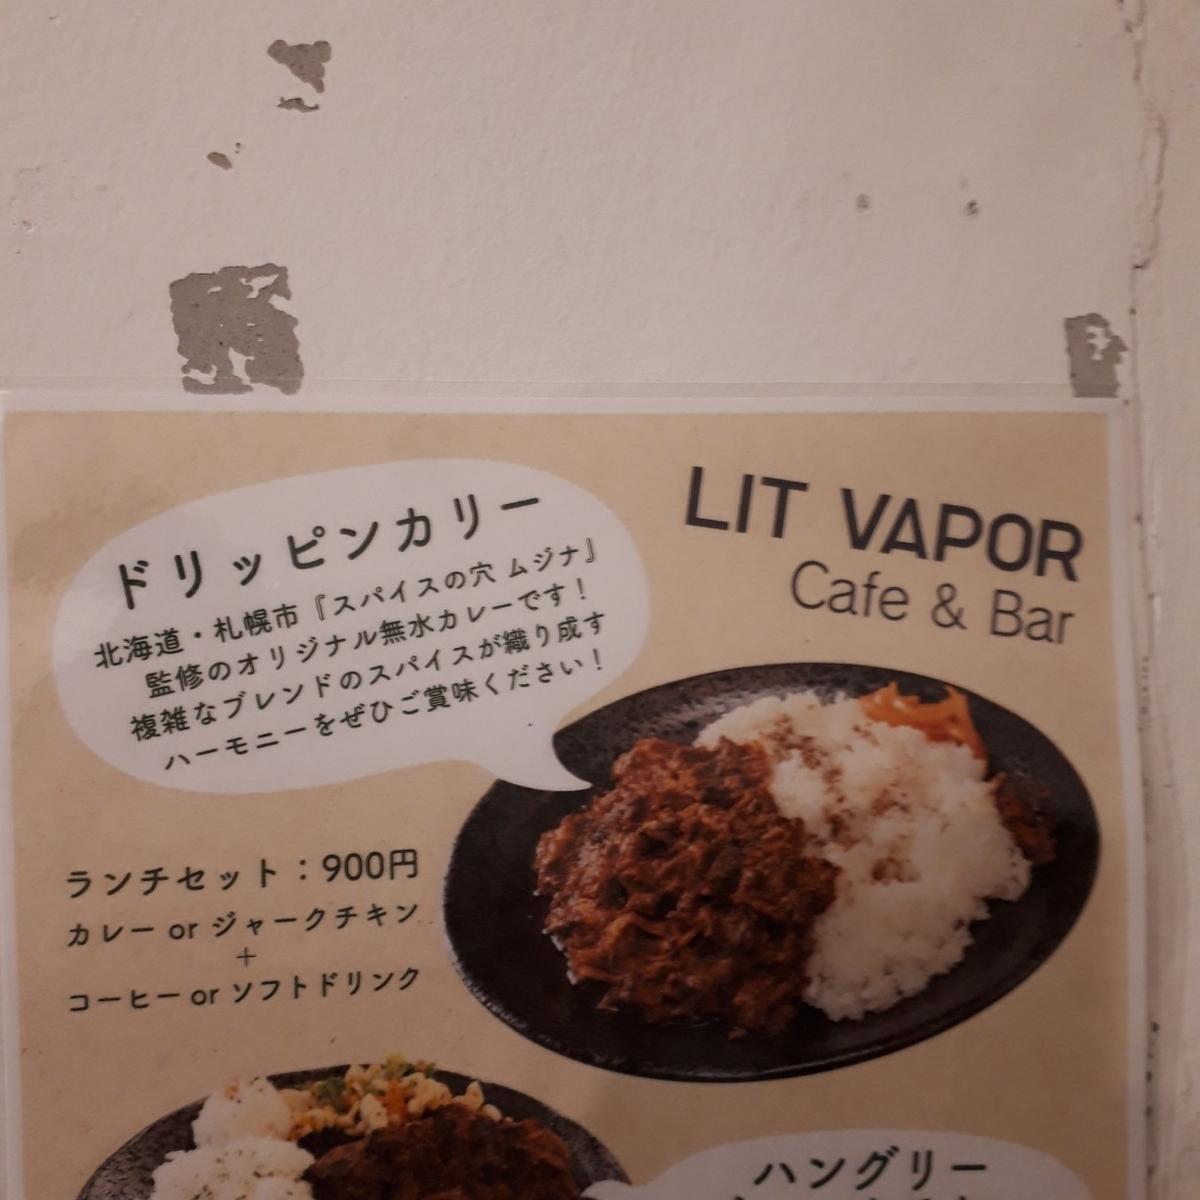 LIT VAPOR Cafe & Bar ドリッピンカリー